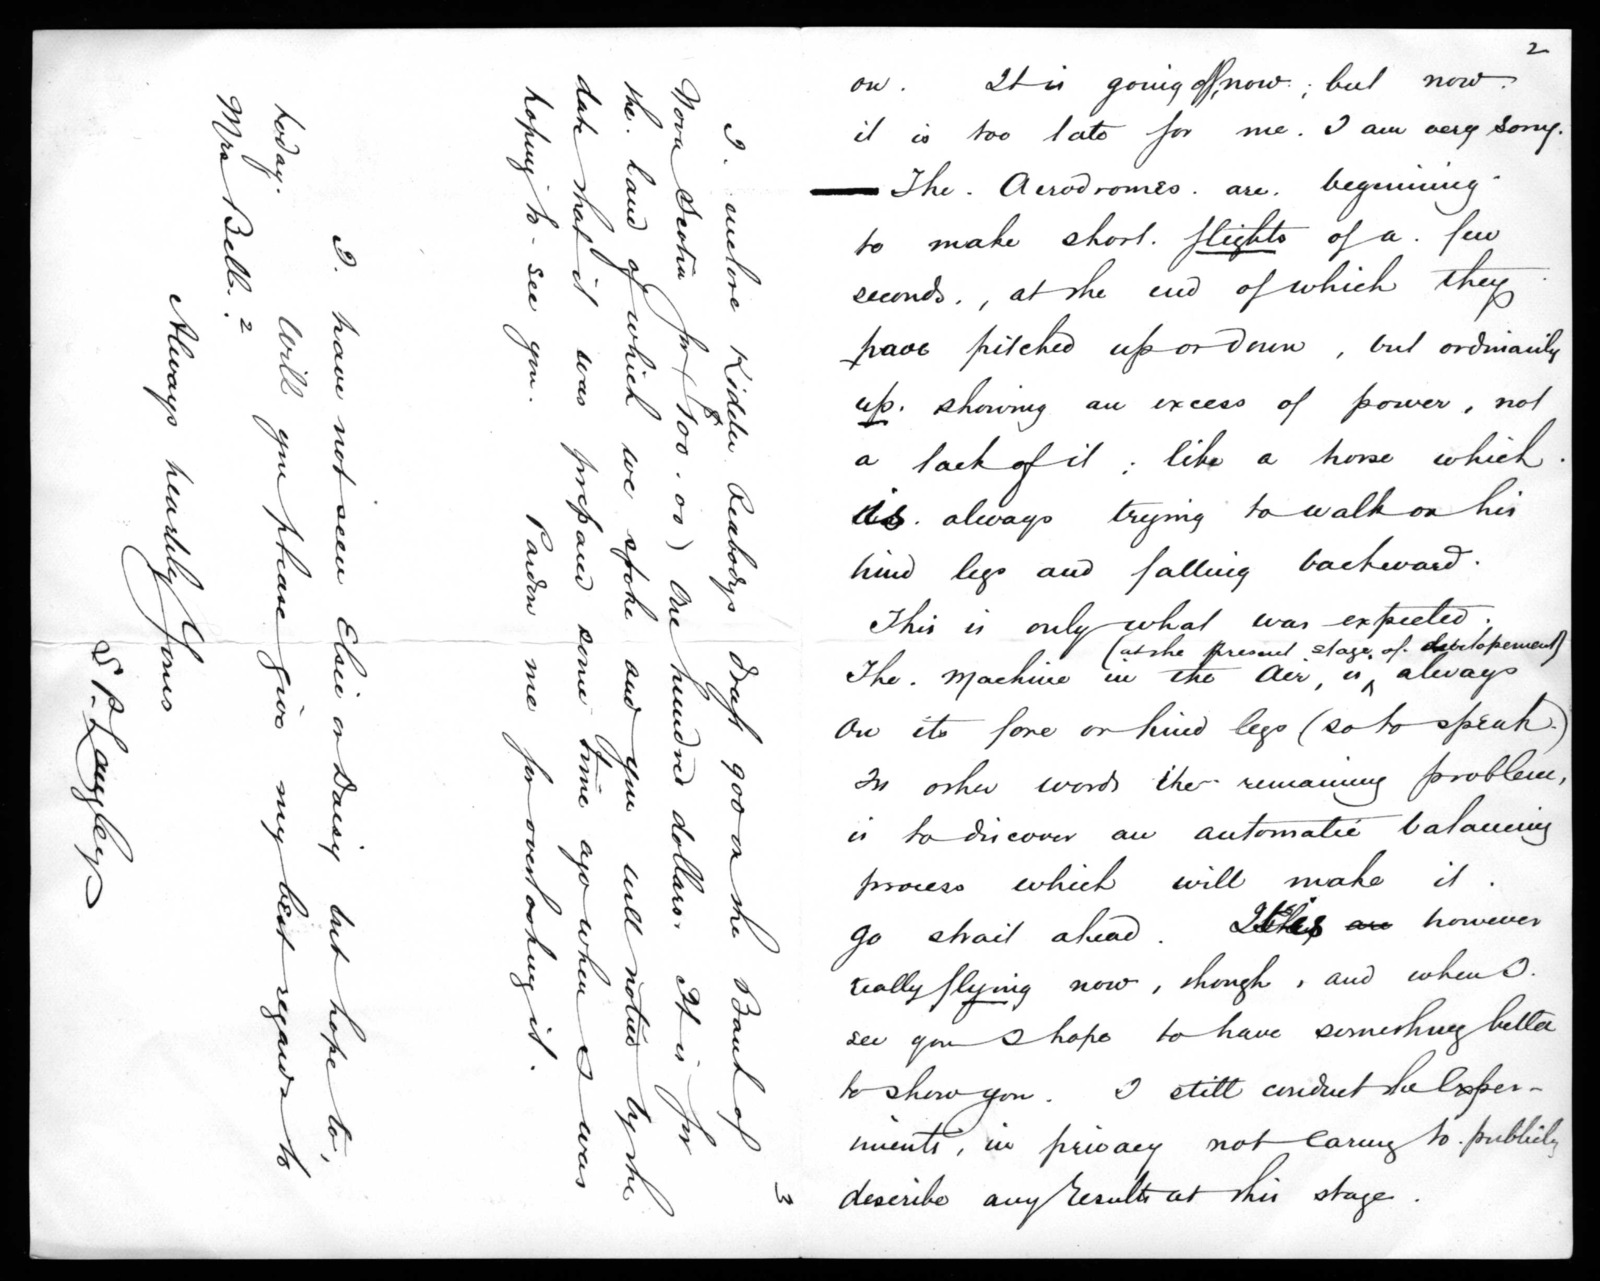 Letter from Samuel P. Langley to Alexander Graham Bell, October 28, 1894